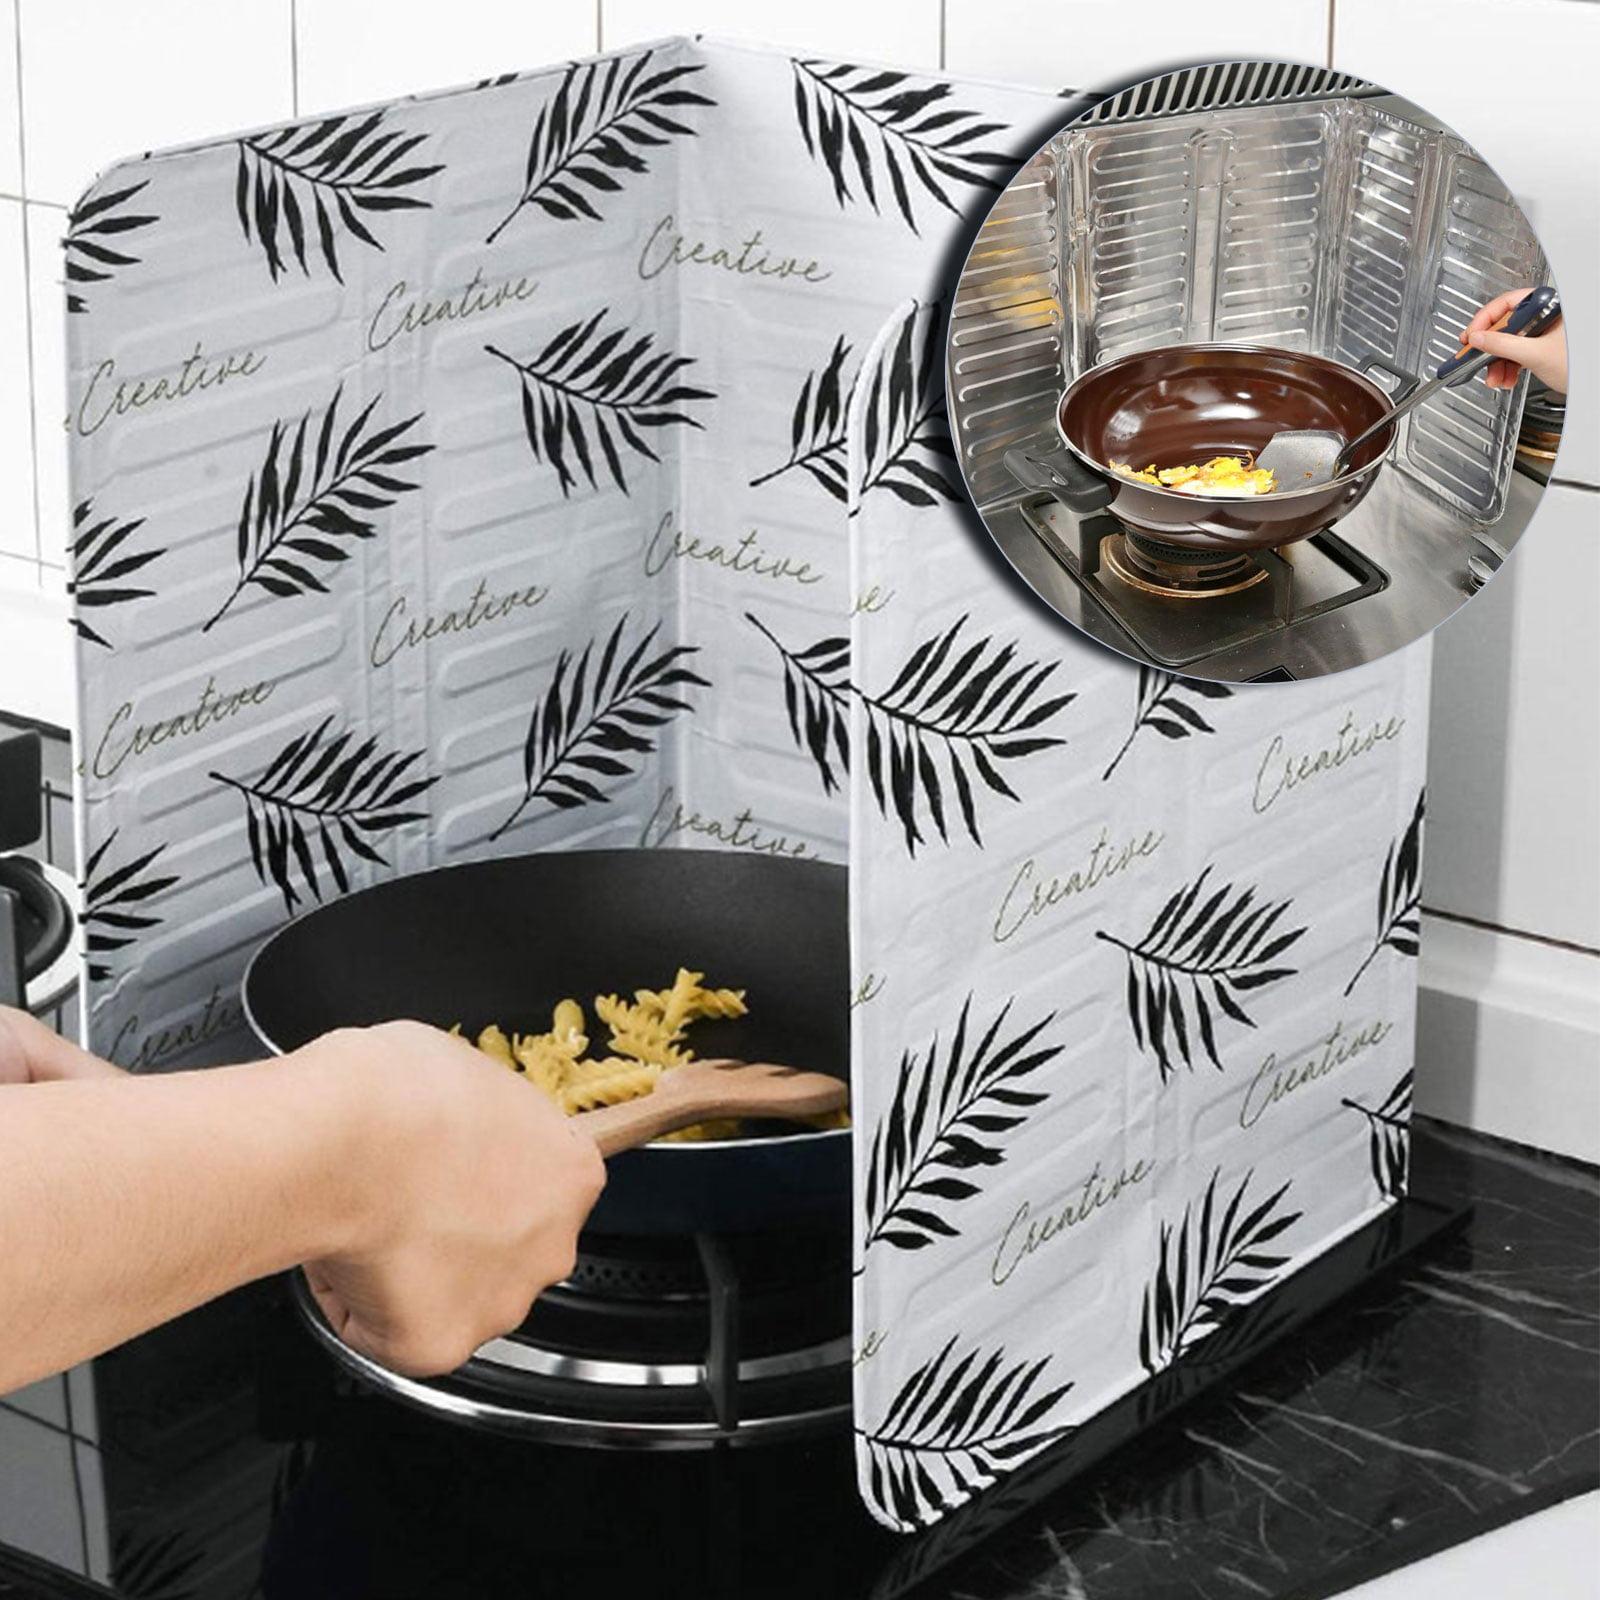 84x 33cm, Black Splatter Guard Home Kitchen Stove Foil Plate Prevent Oil Splash Cooking Hot Baffle Kitchen Tool